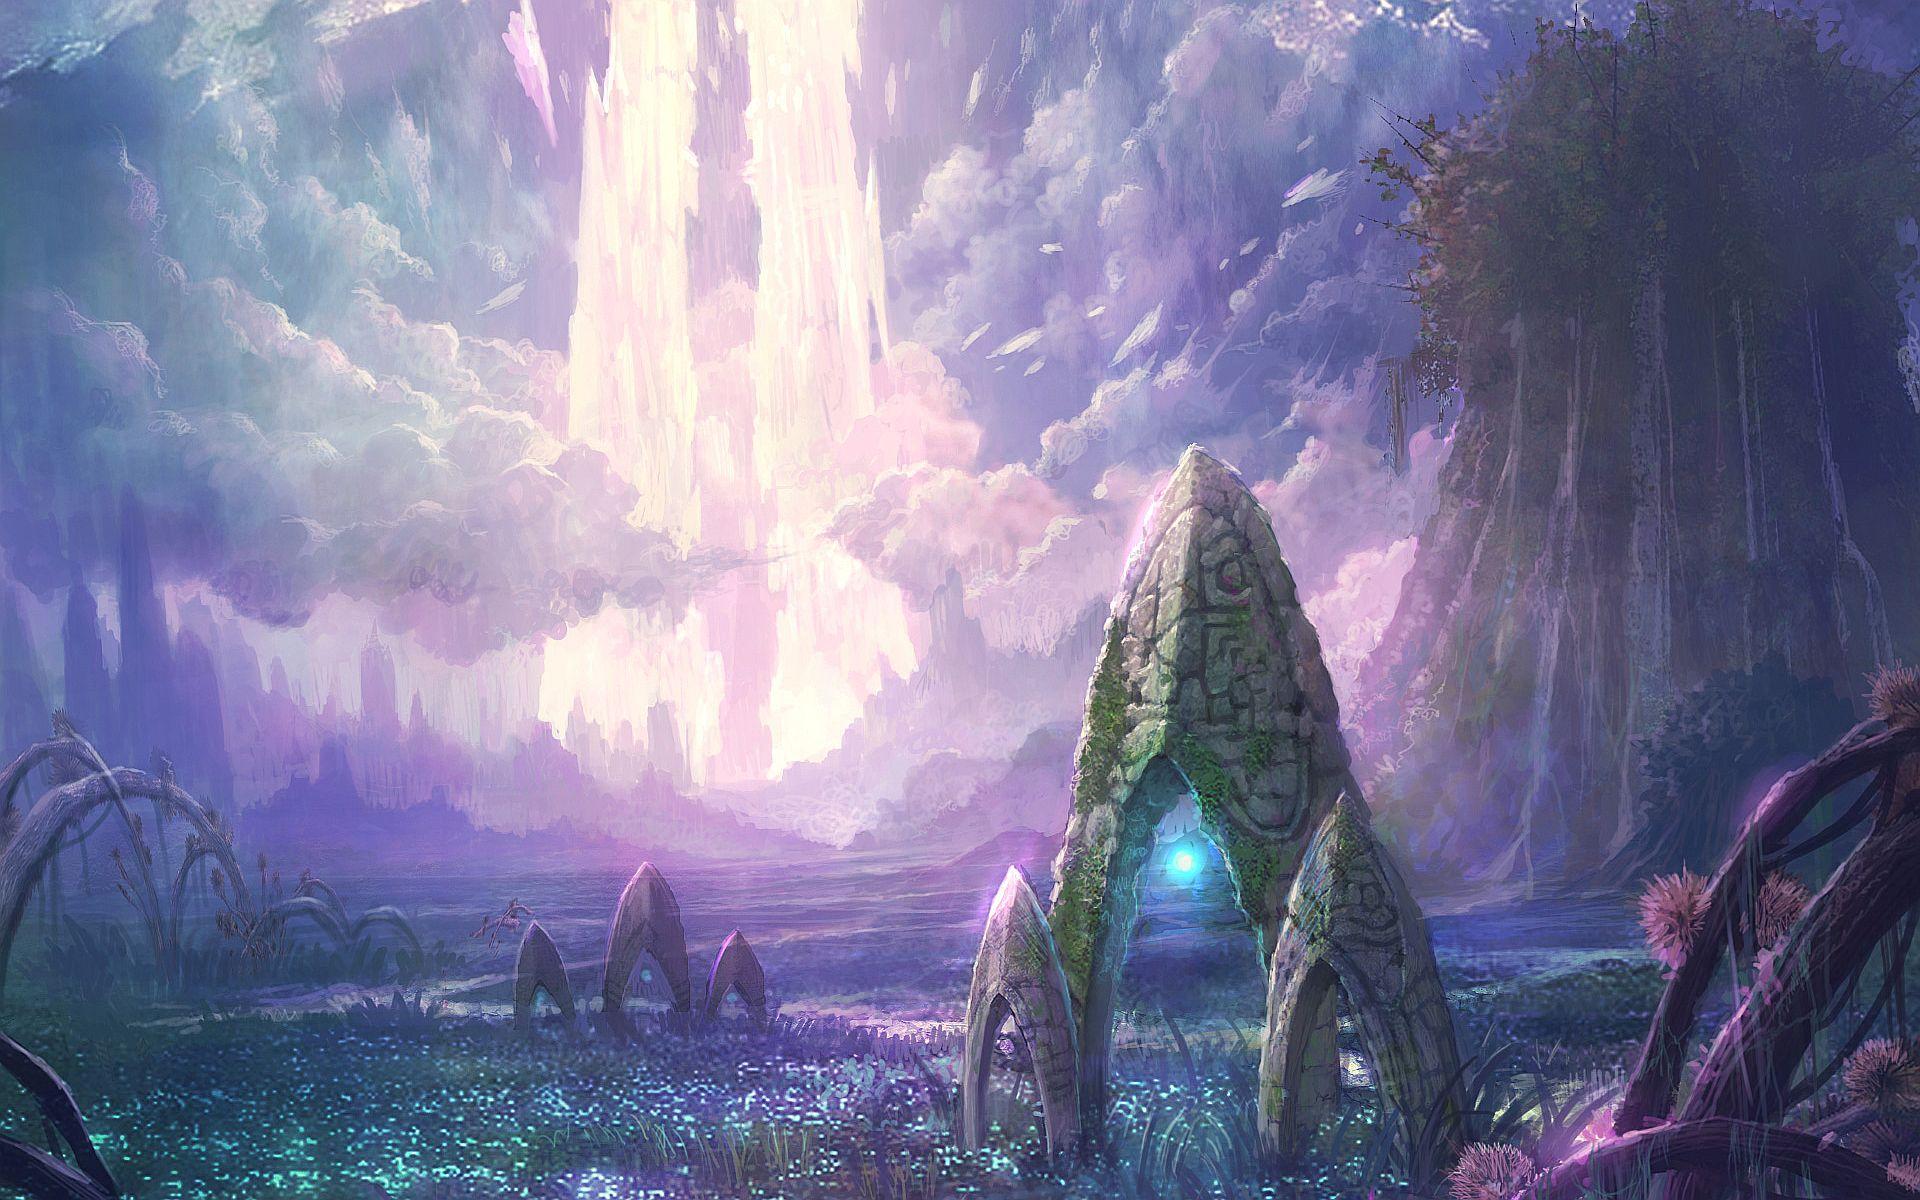 Video Games Aion Fantasy Art Artwork MMORPG 1920x1200 Wallpaper